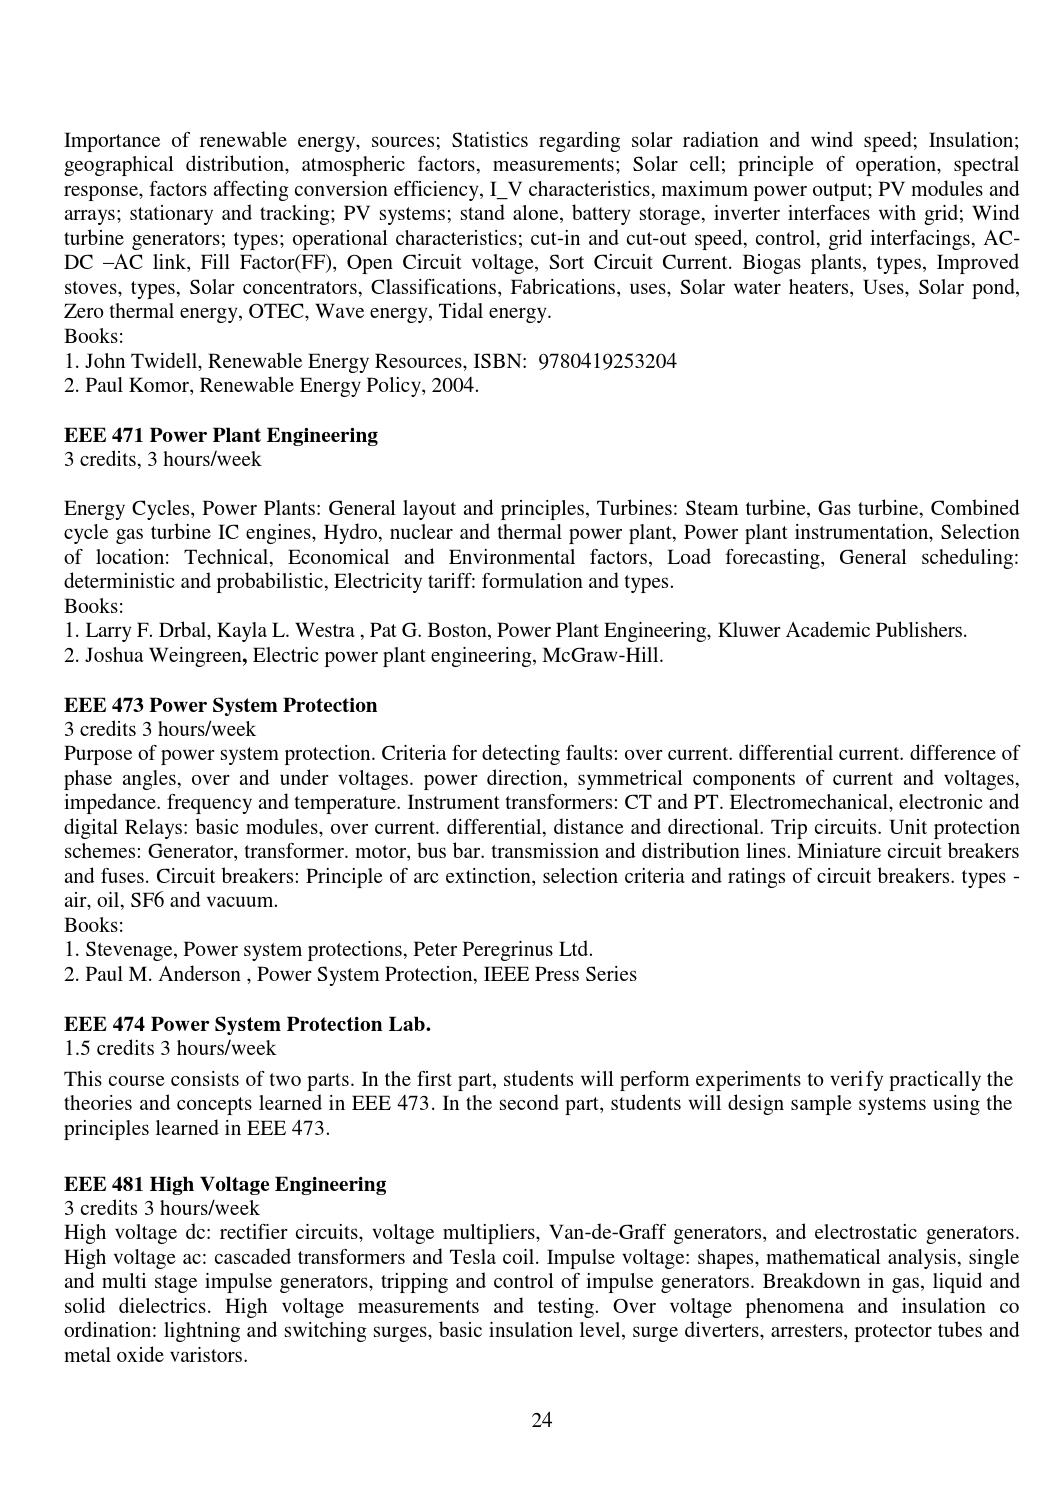 Bsc In Eee Syllabus For Website By Eeeuttara Issuu Power Plant Engineering Layout